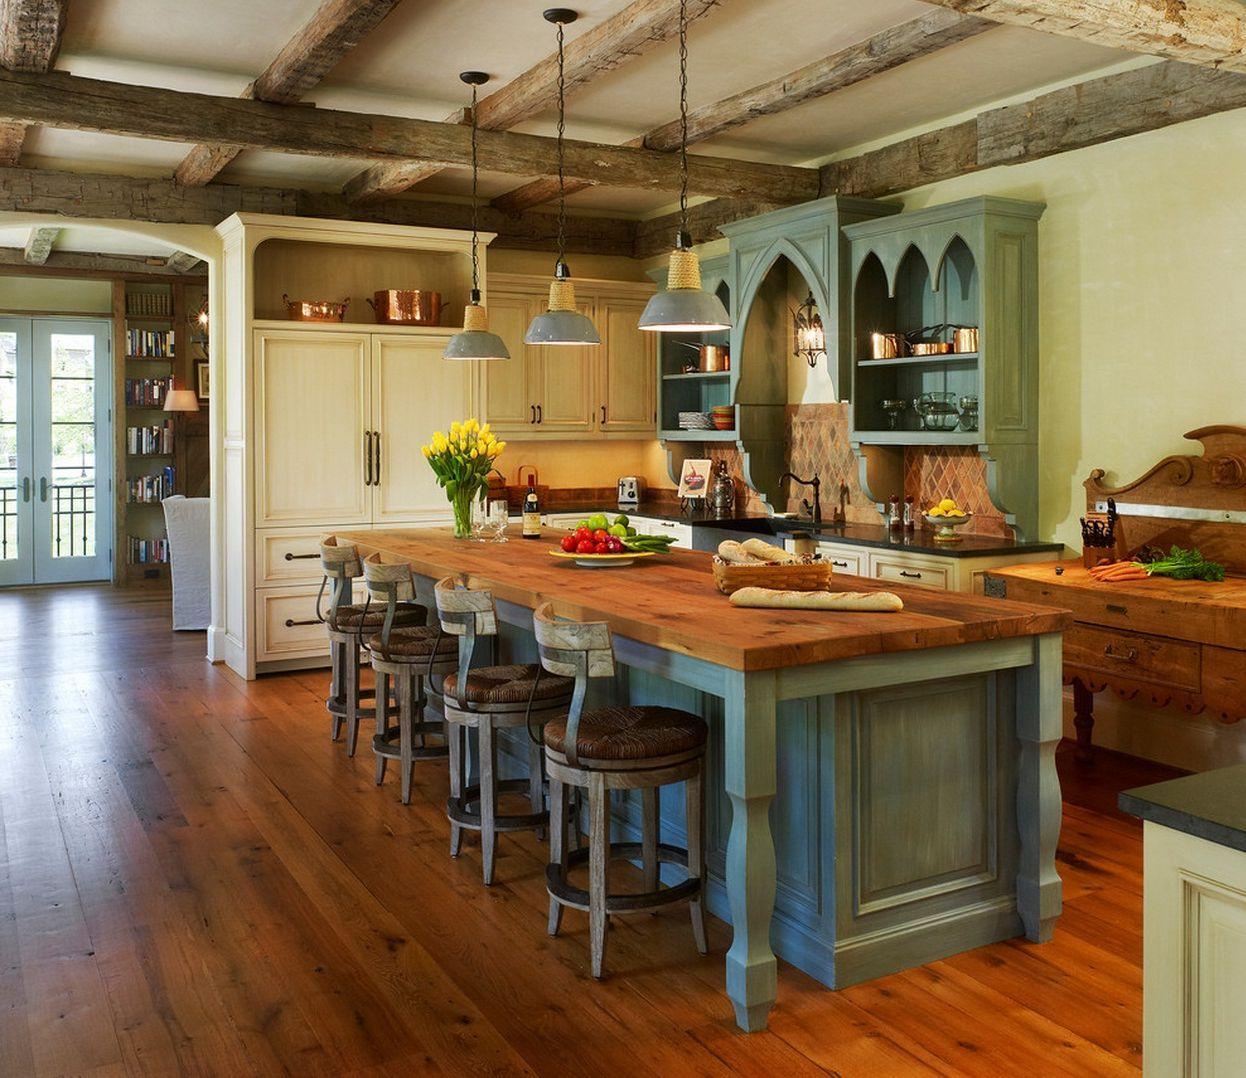 rustic-modern-kitchen-with-antique-look-interior design ideas